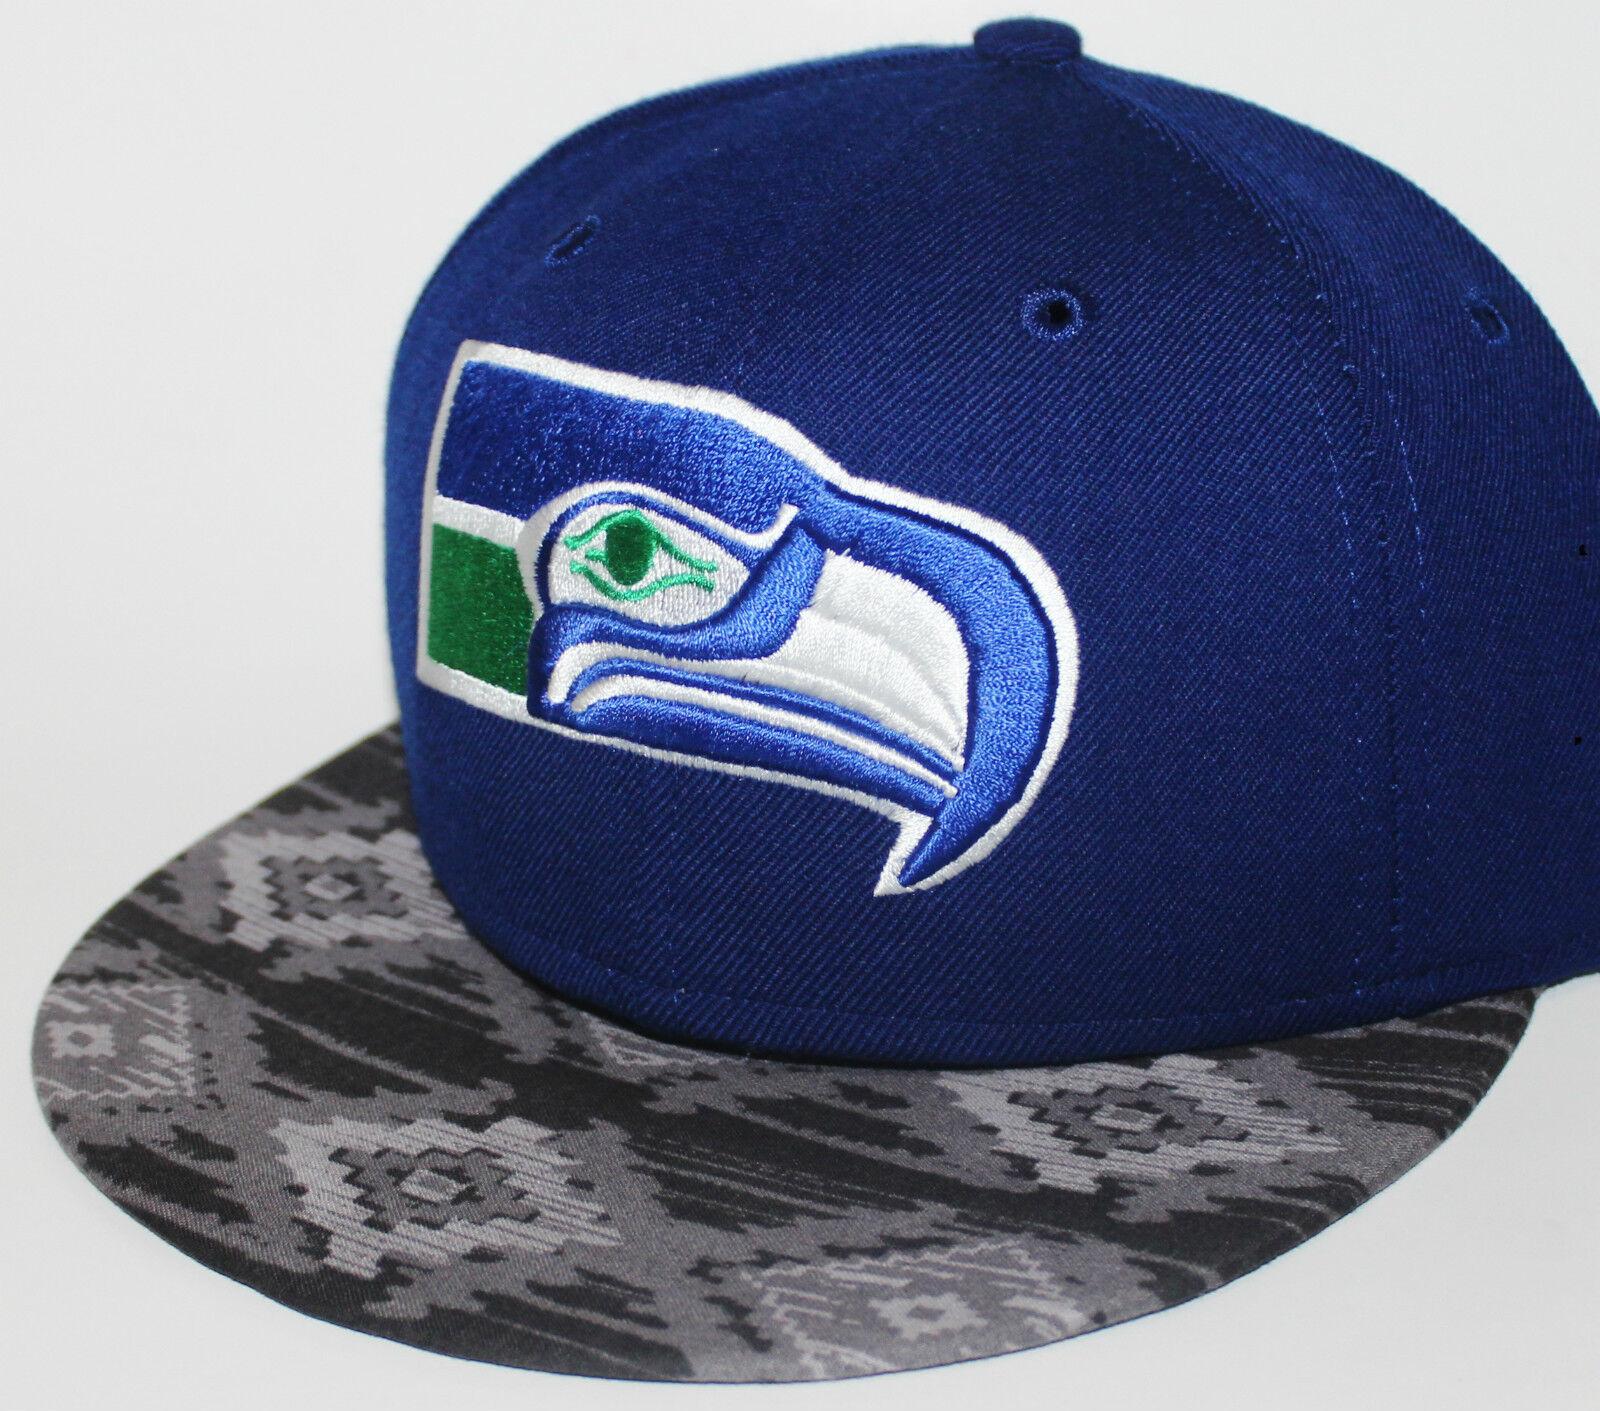 PICK1 Seattle Seahawks Native / Galaxy / Weed Bri… - image 10